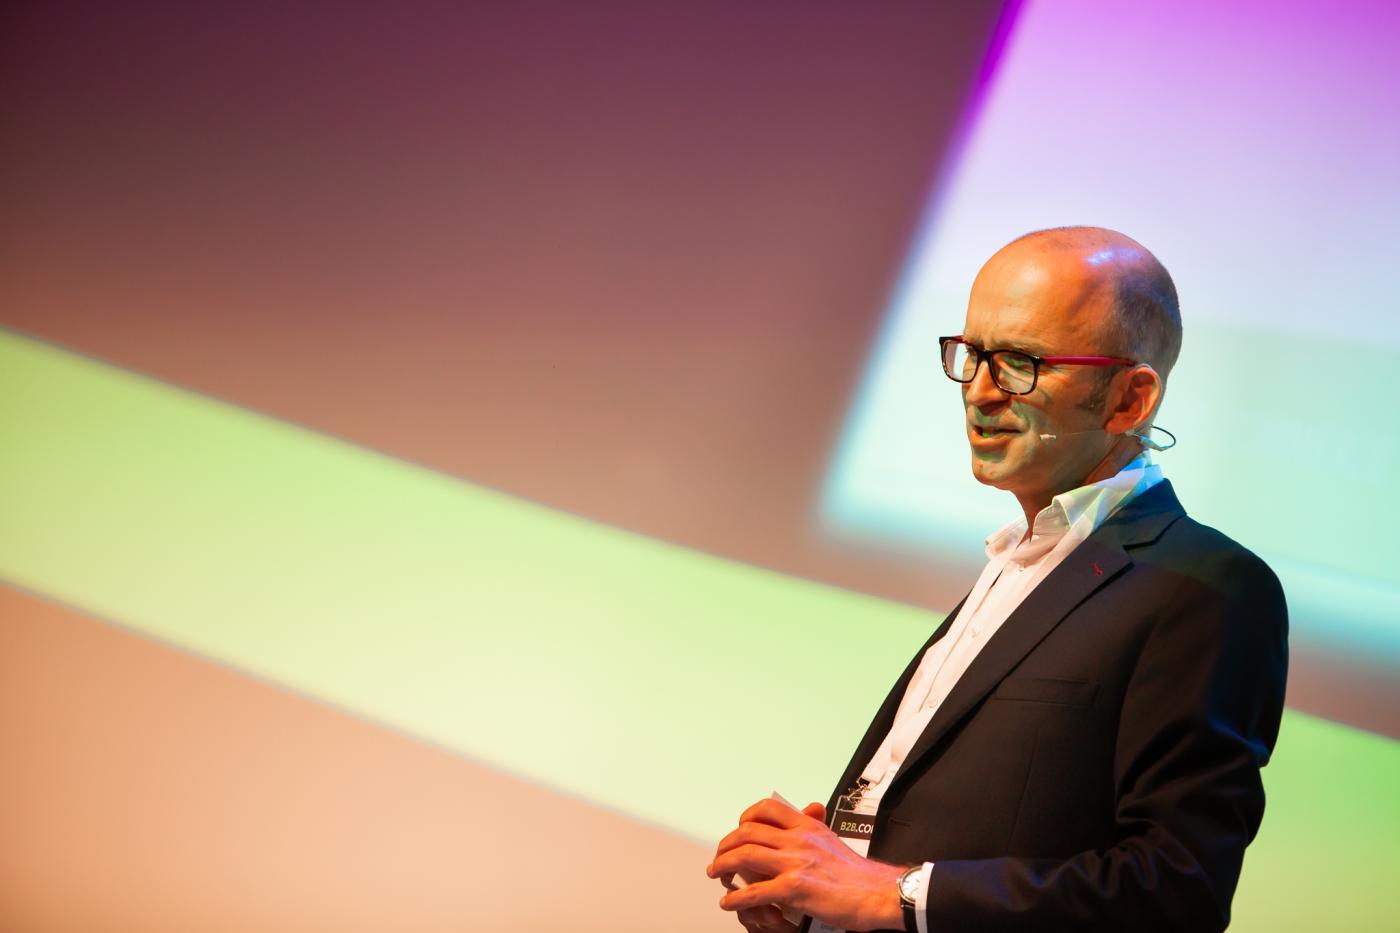 Martin van Dam spreekt tijdens B2B.Commerce